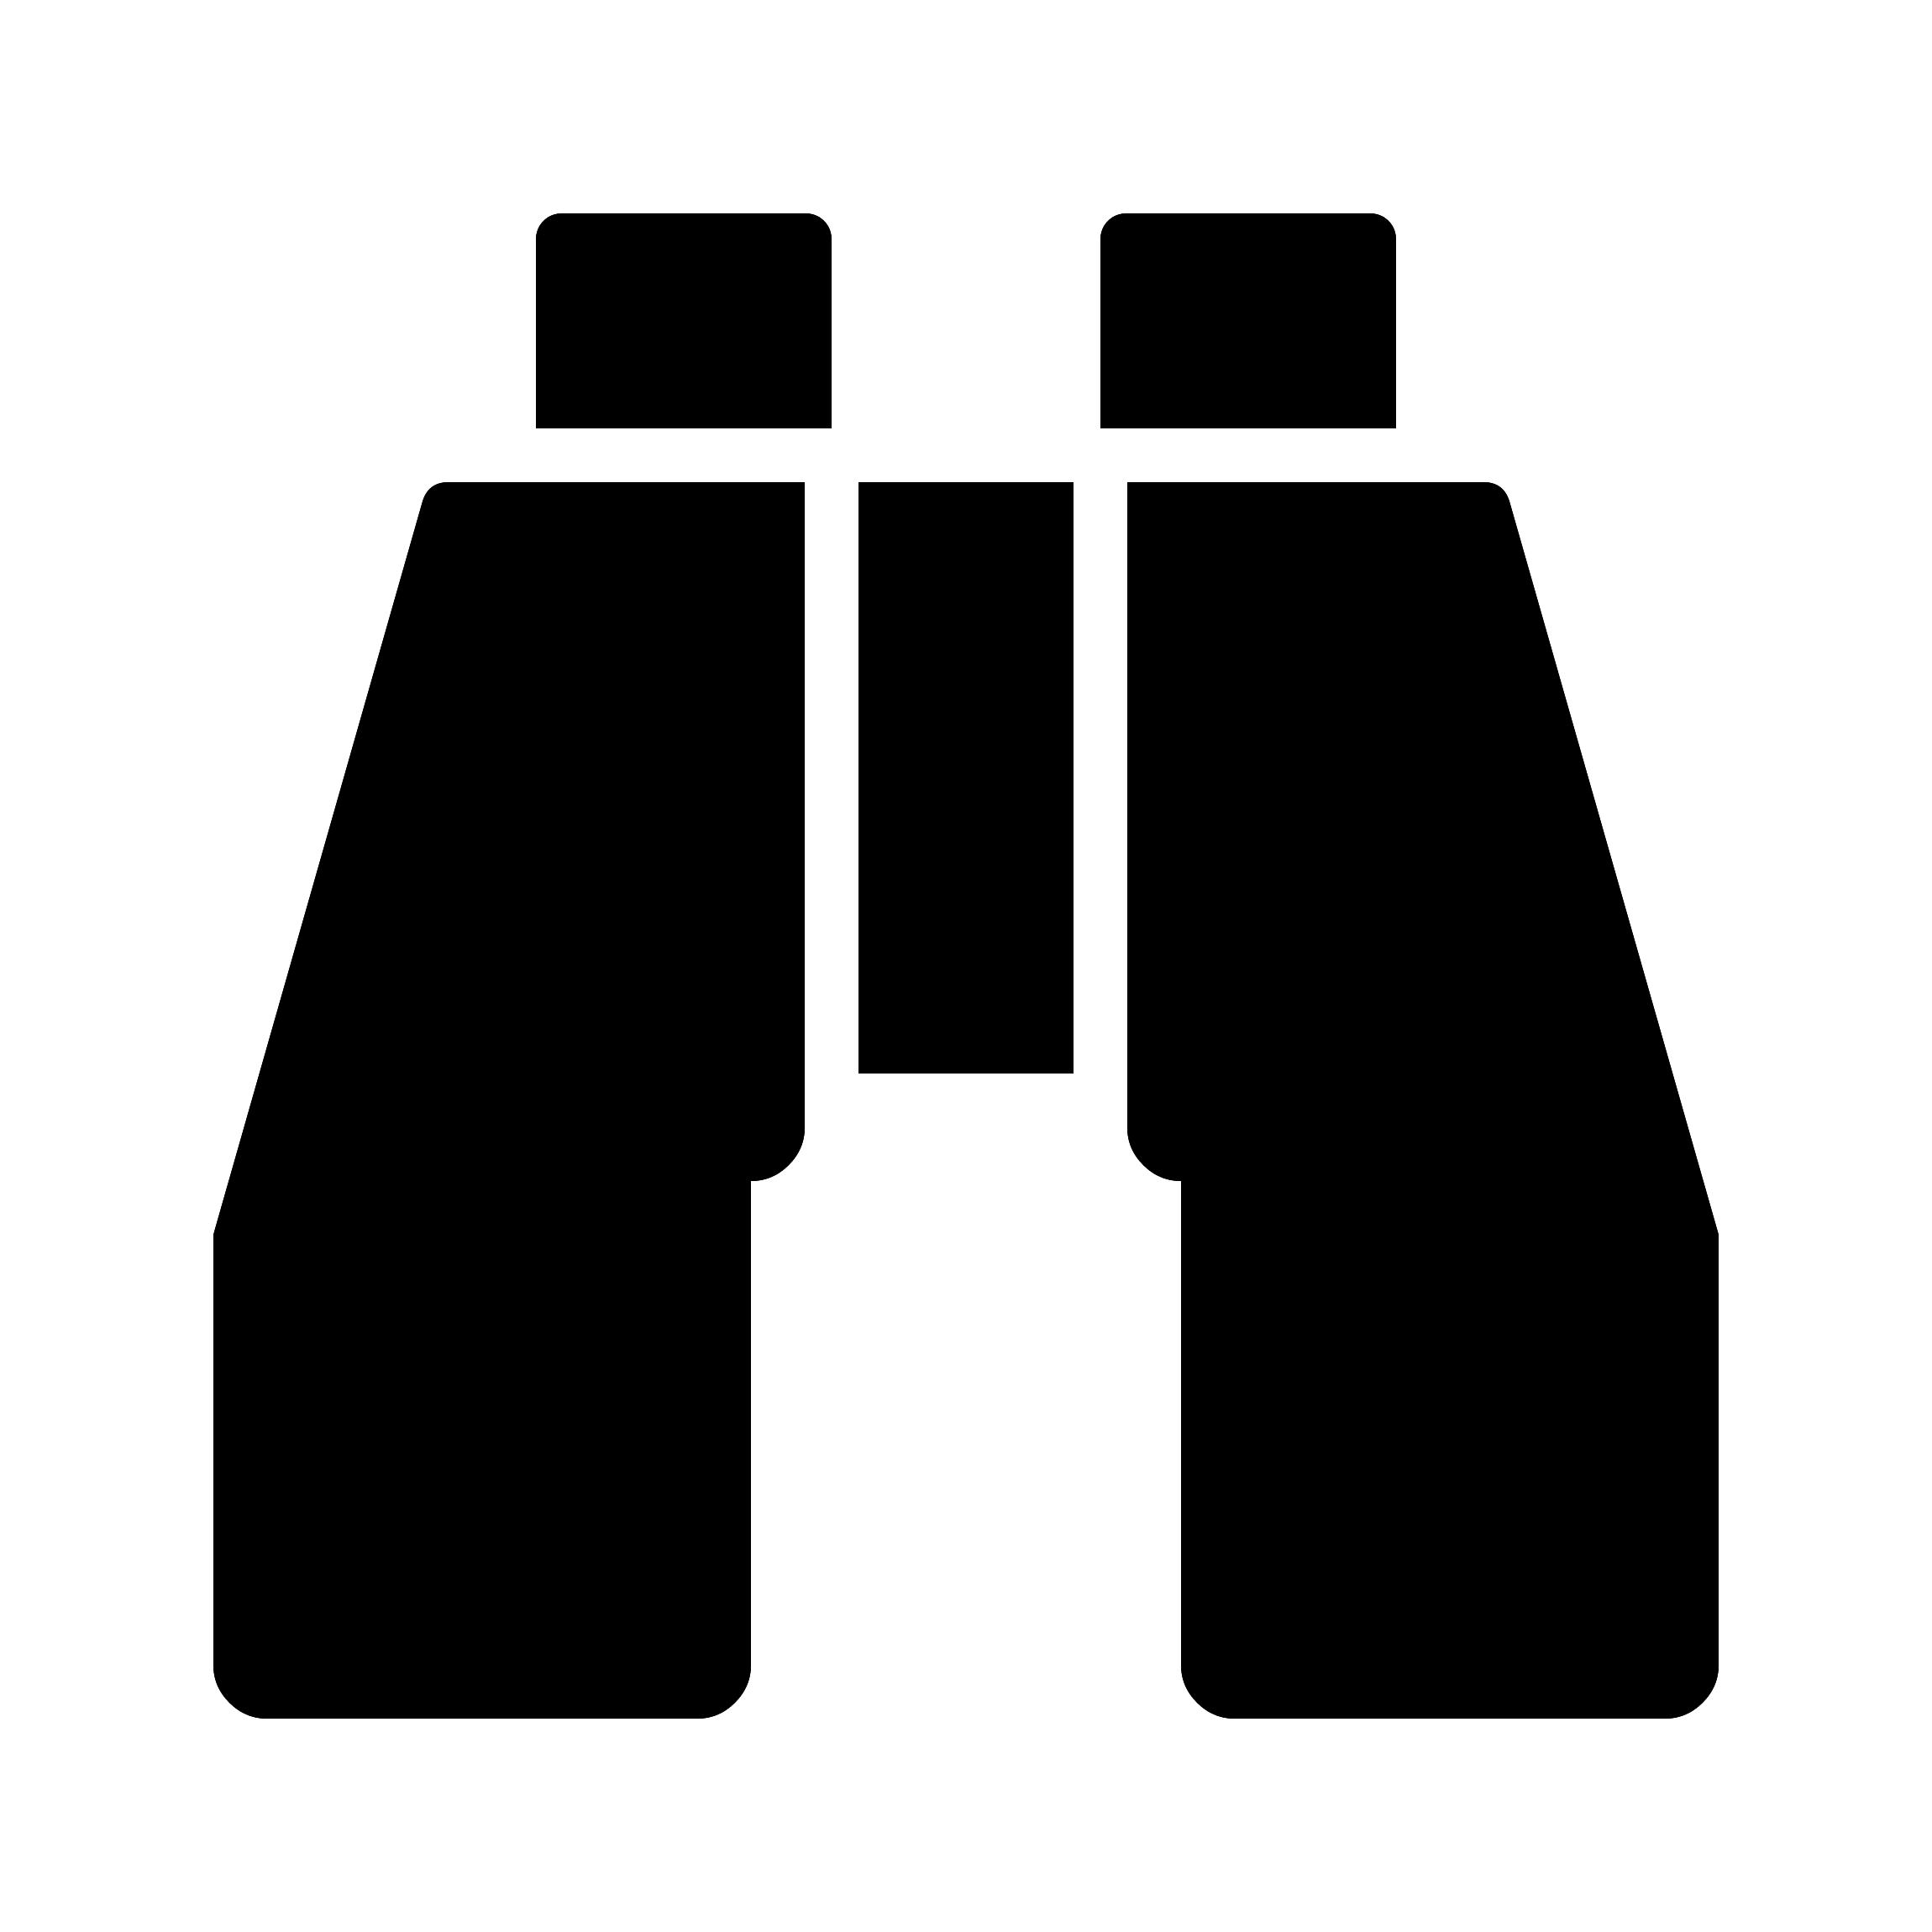 data/images/binoculars.png